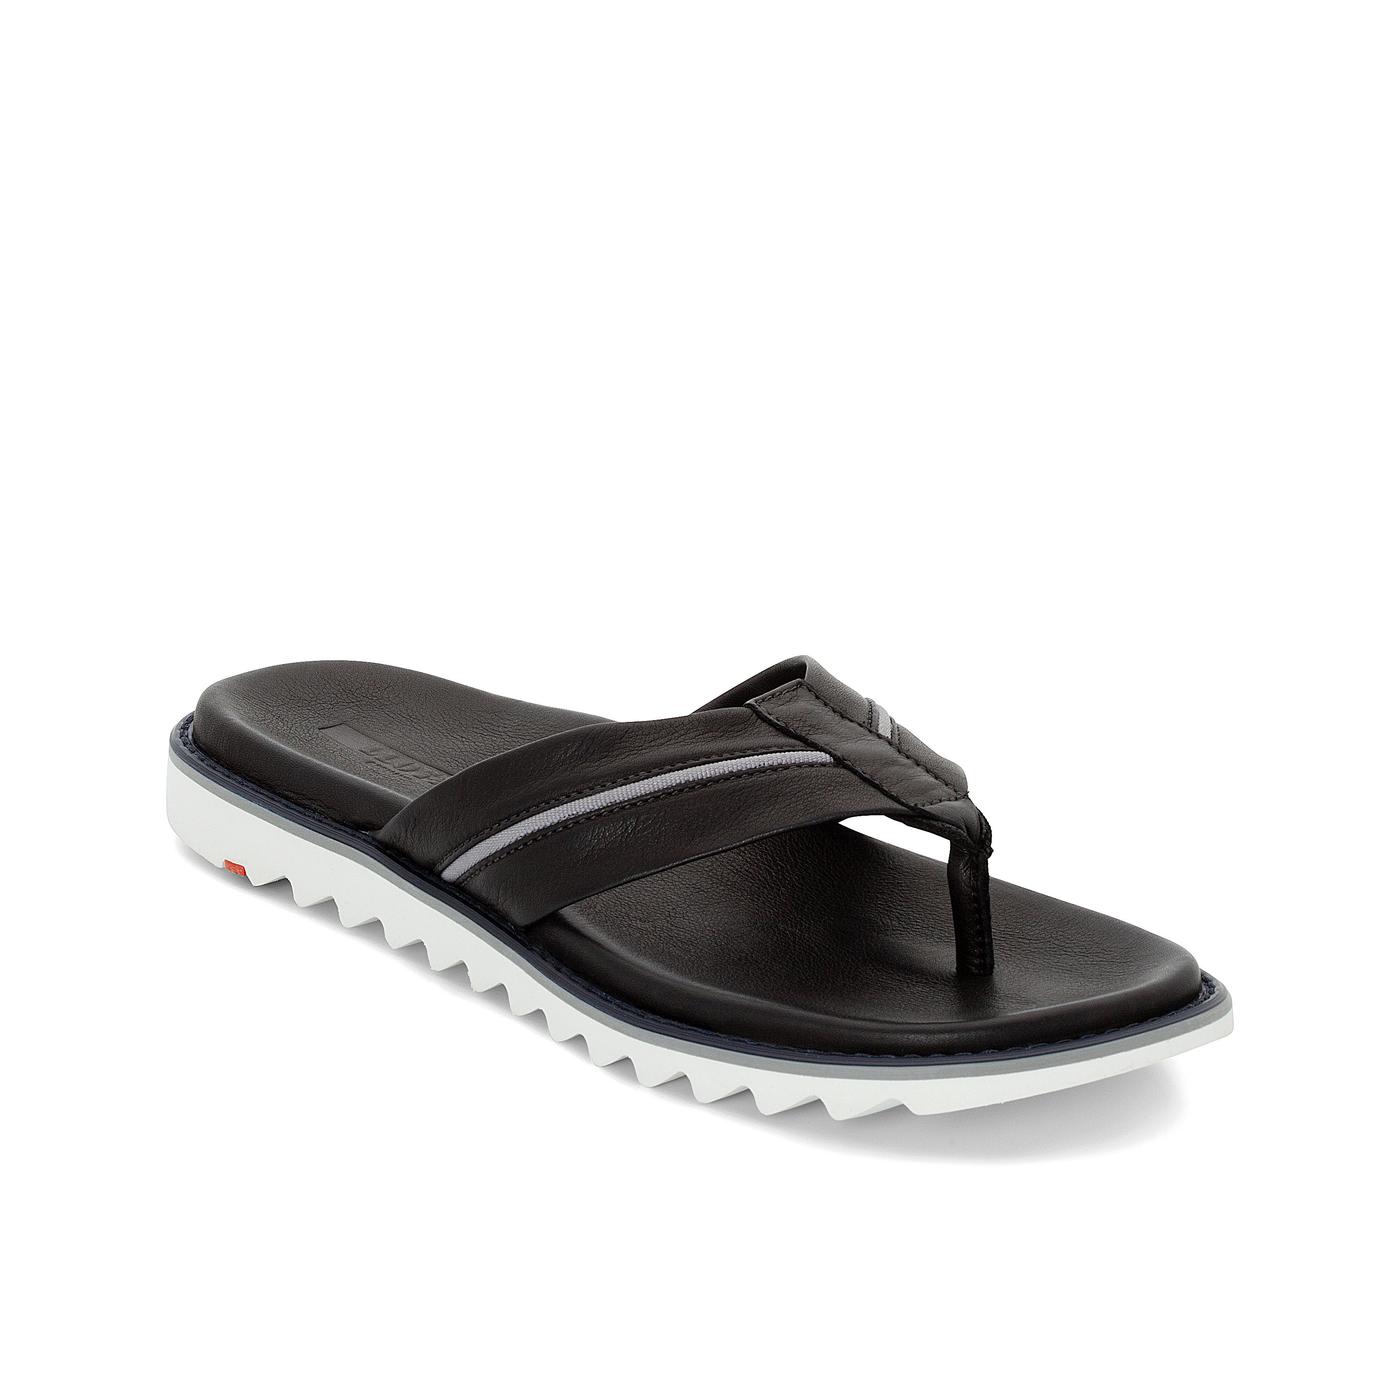 ELKAN | Schuhe > Sandalen & Zehentrenner | Lloyd